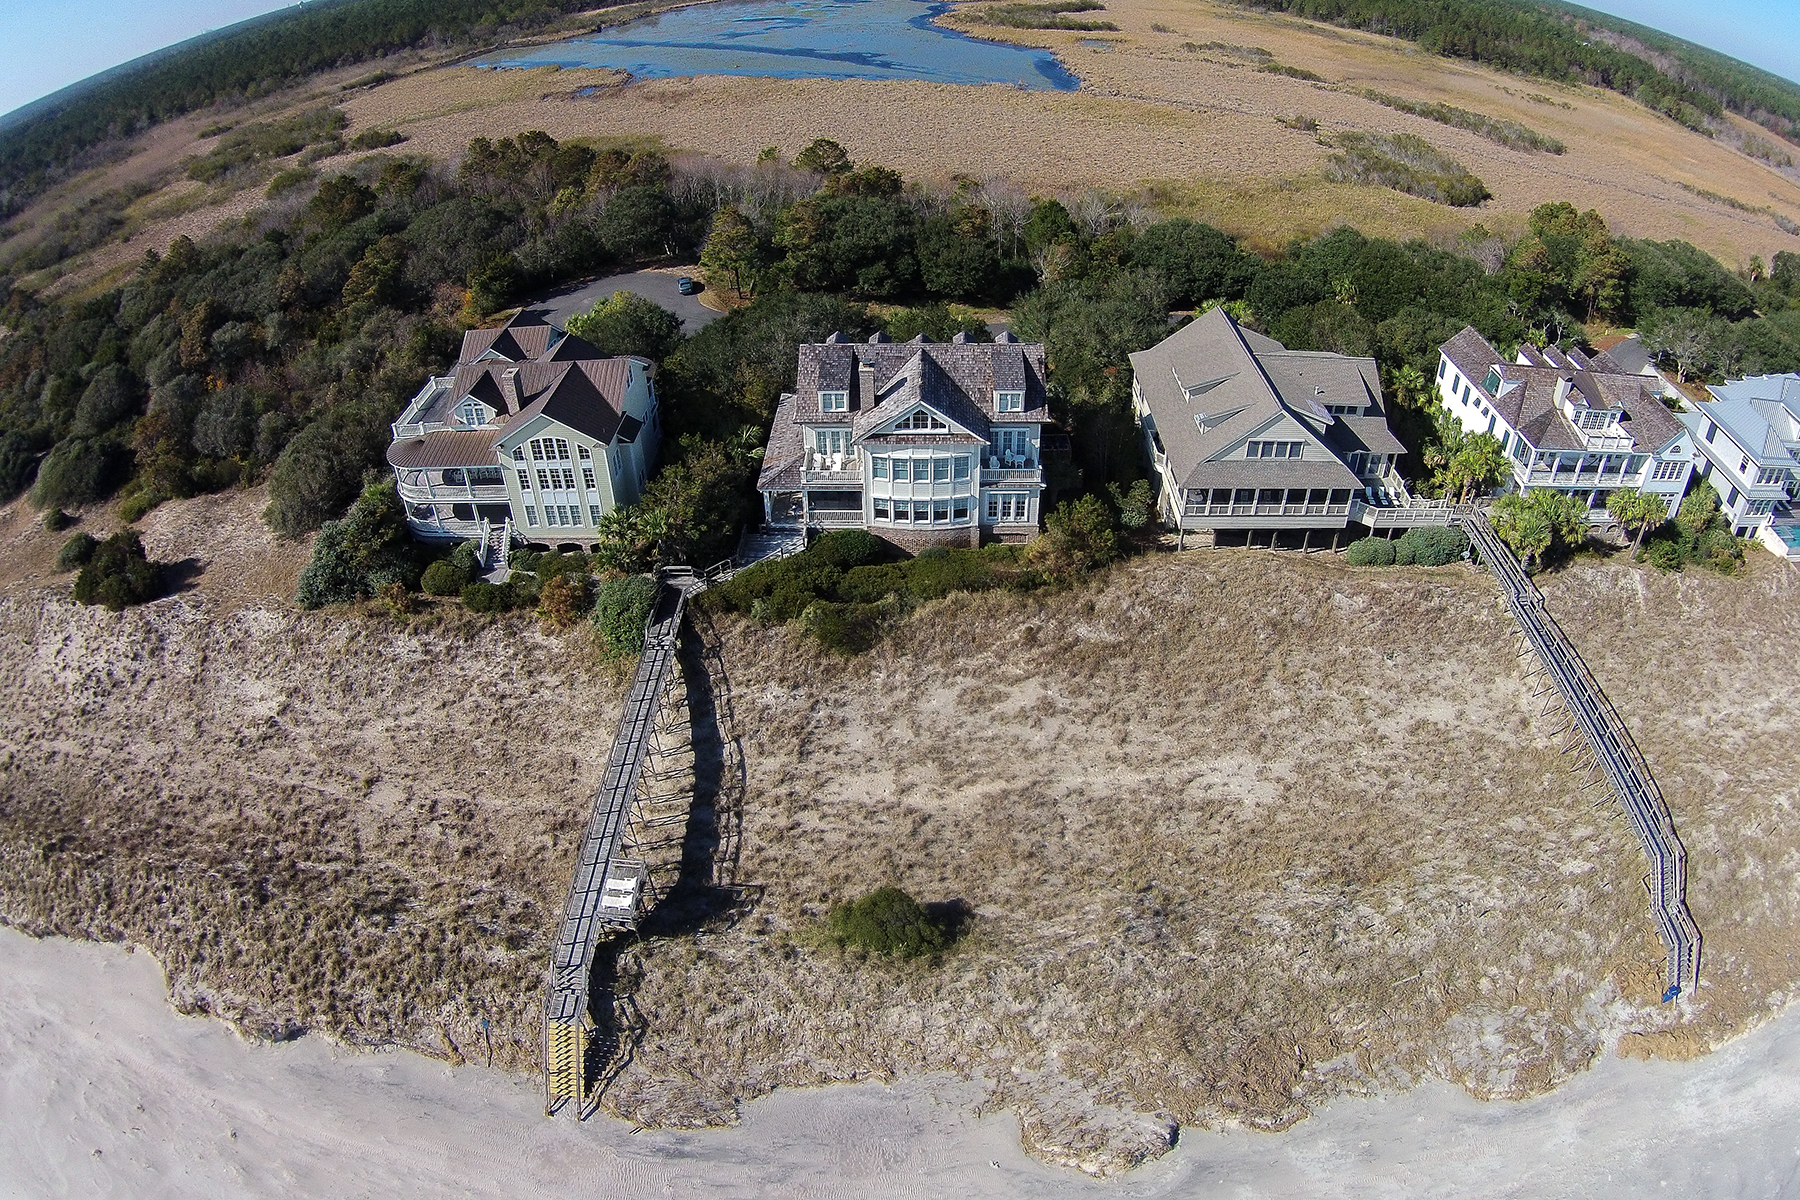 PG - Beach Brdg - drone 1 RS.jpg